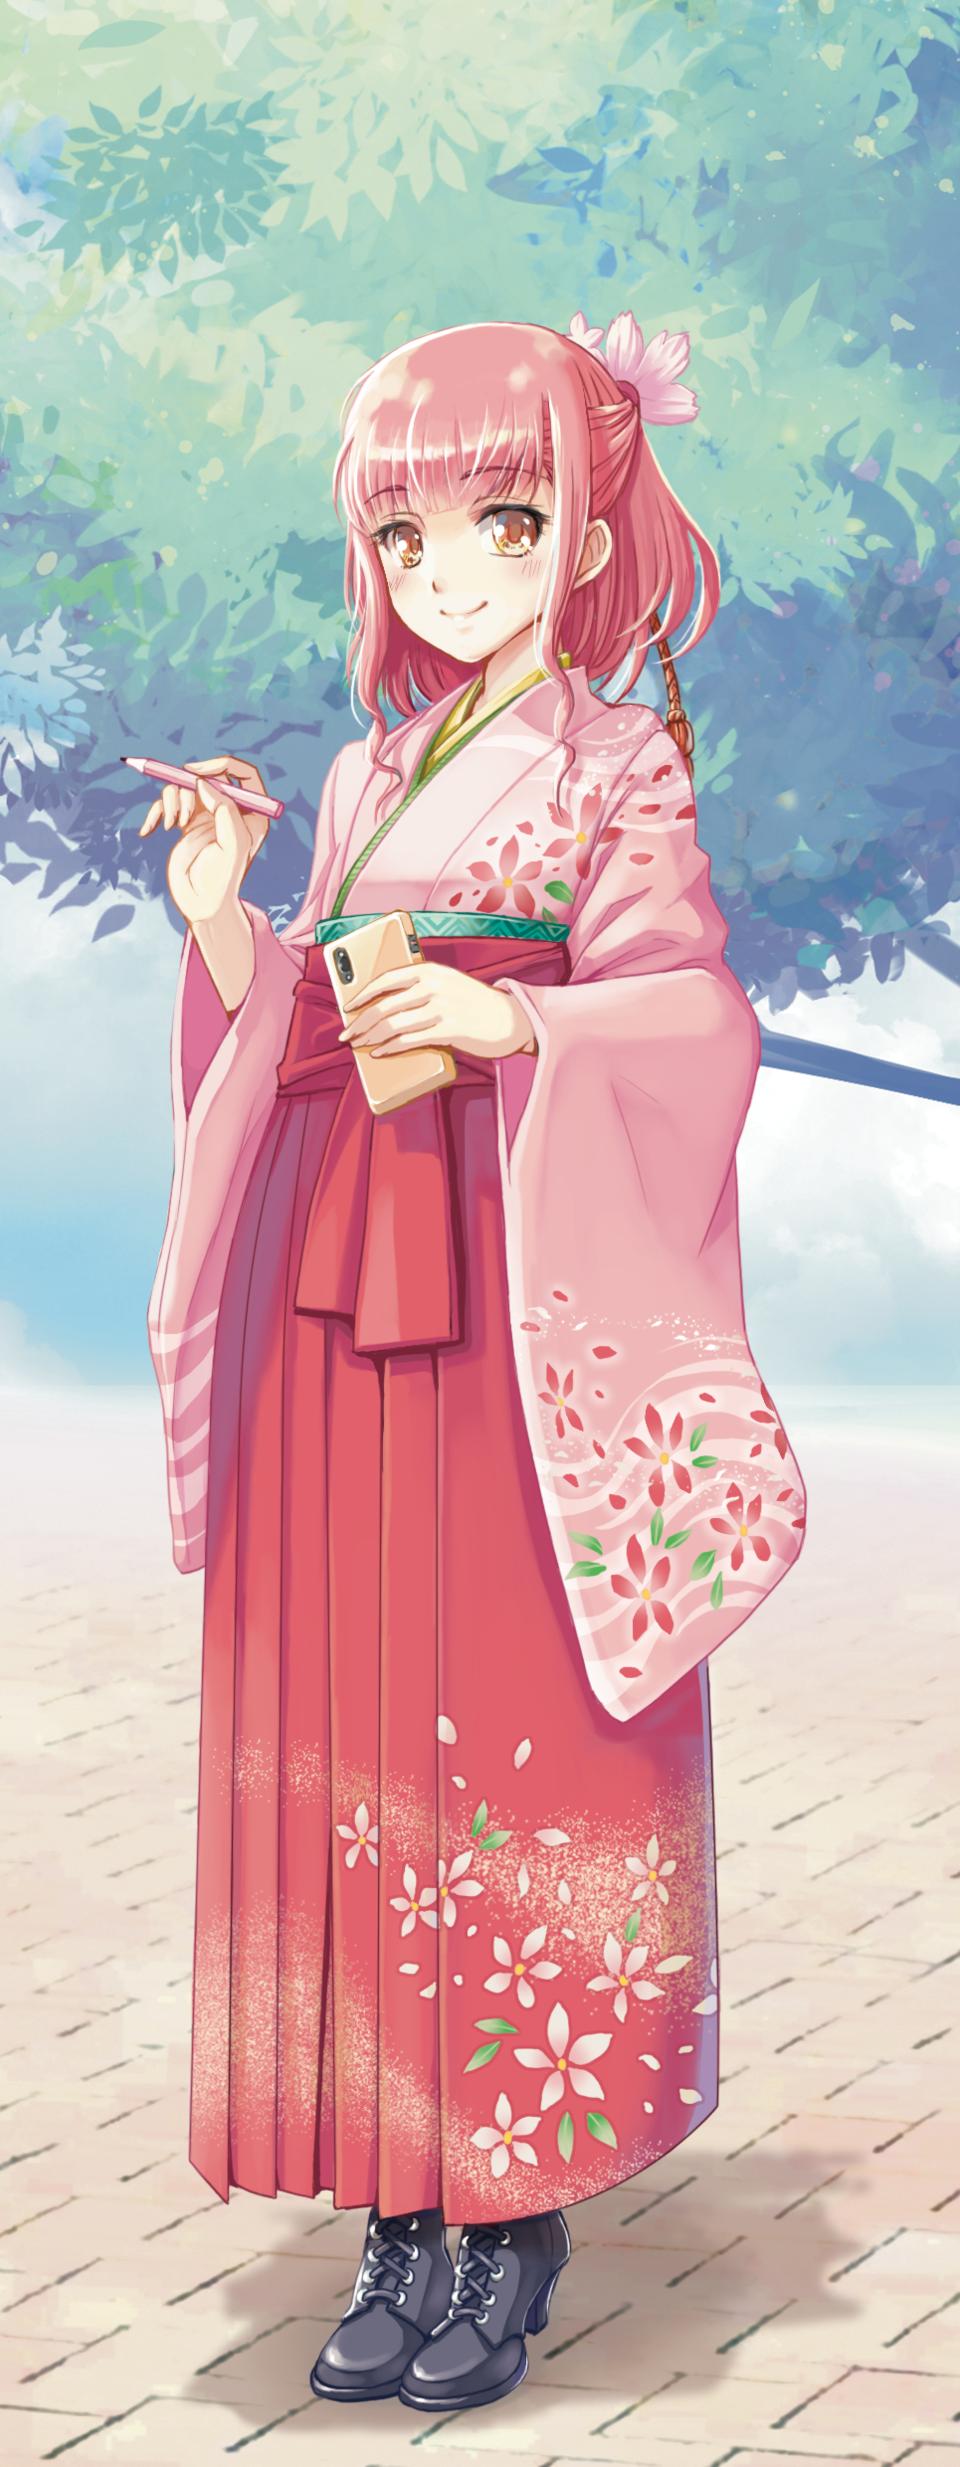 PASTEL_SKETCH2020 PINK Illust of 雄 PASTEL_SKETCH2020 girl Japanese_style 袴 kimono original